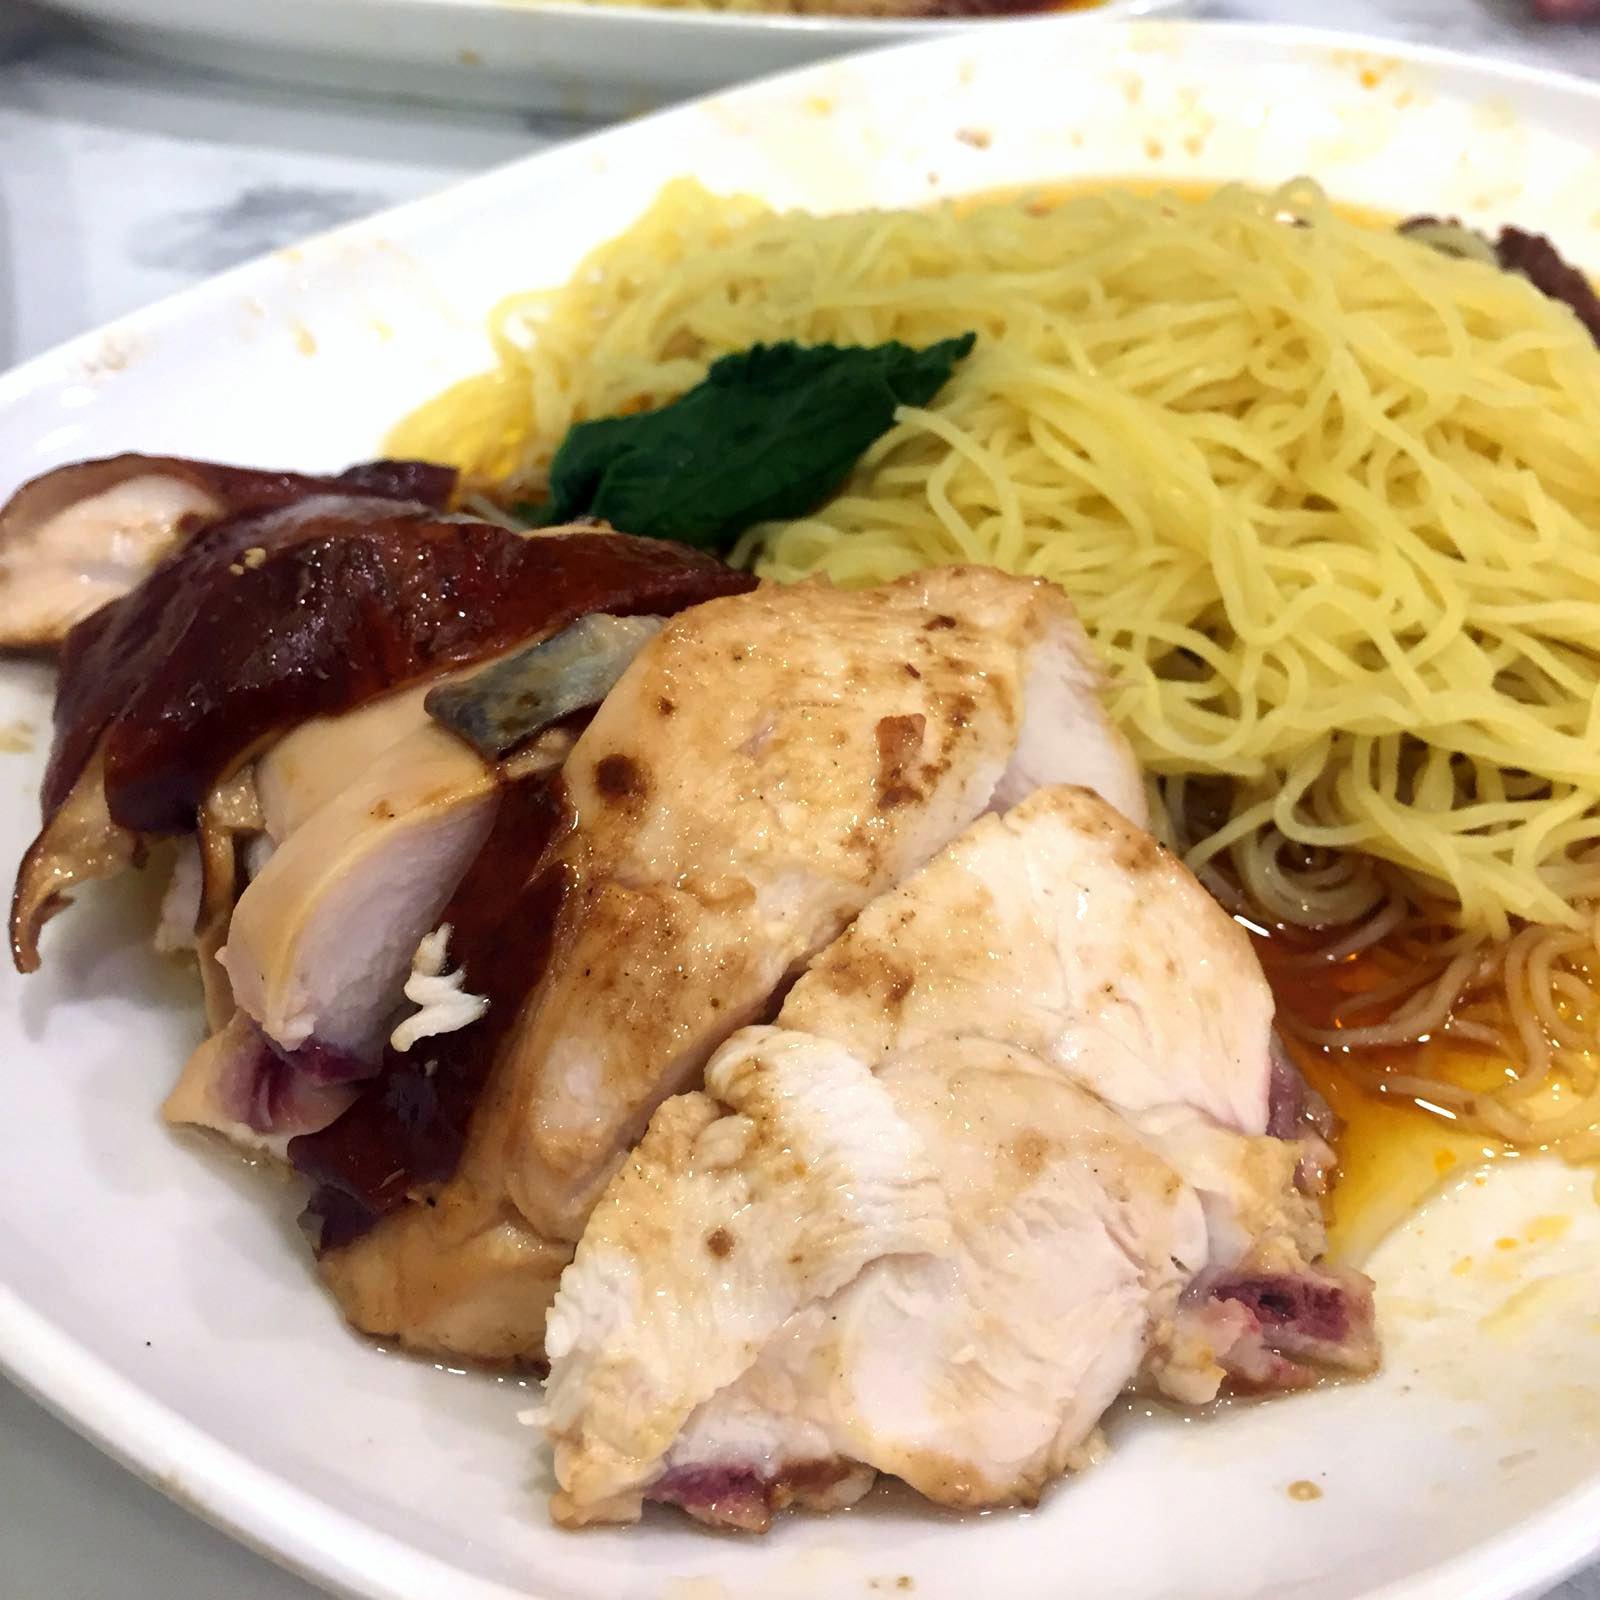 Liao Fan Hong Kong Soya Sauce Chicken Rice & Noodle, one Michelin star